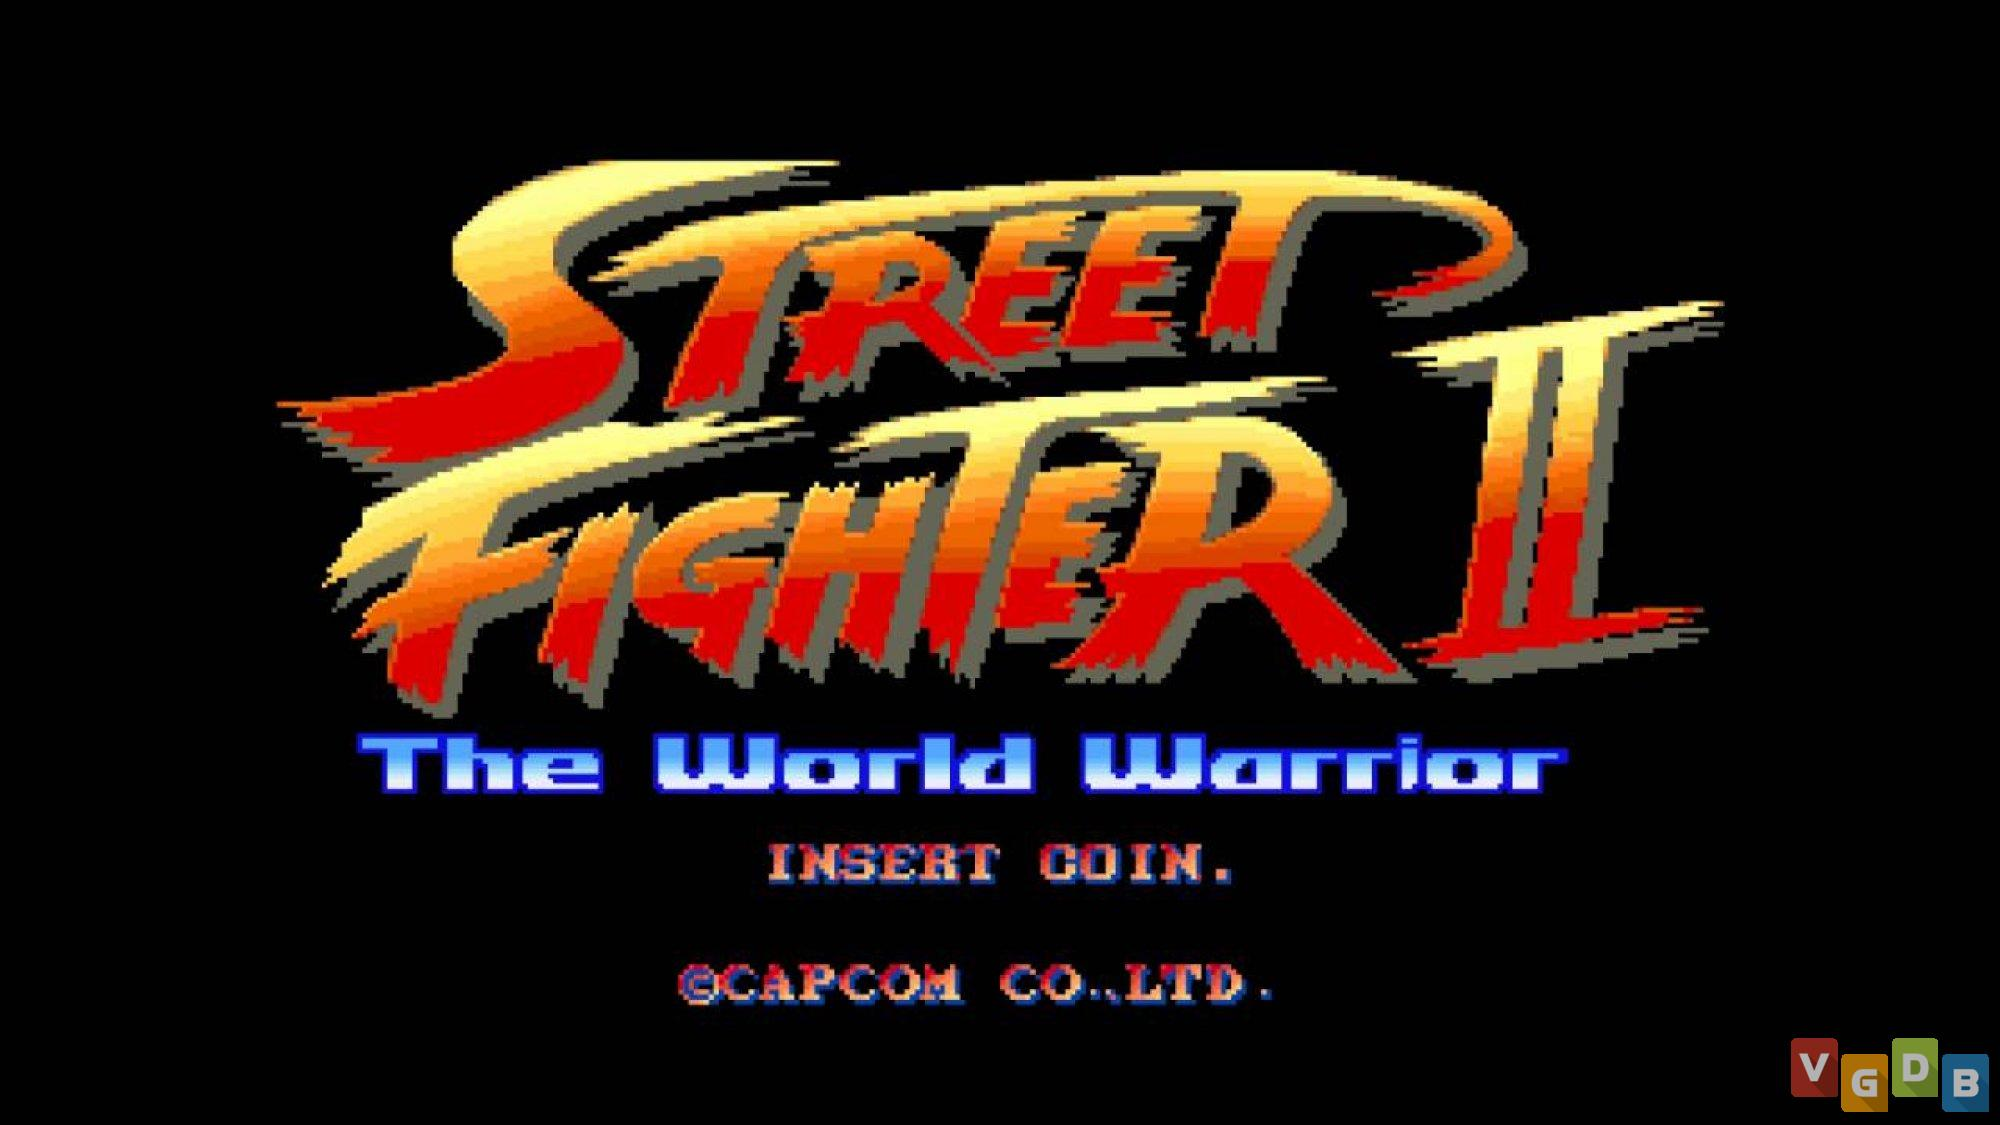 Street Fighter II: The World Warrior - VGDB - Vídeo Game Data Base